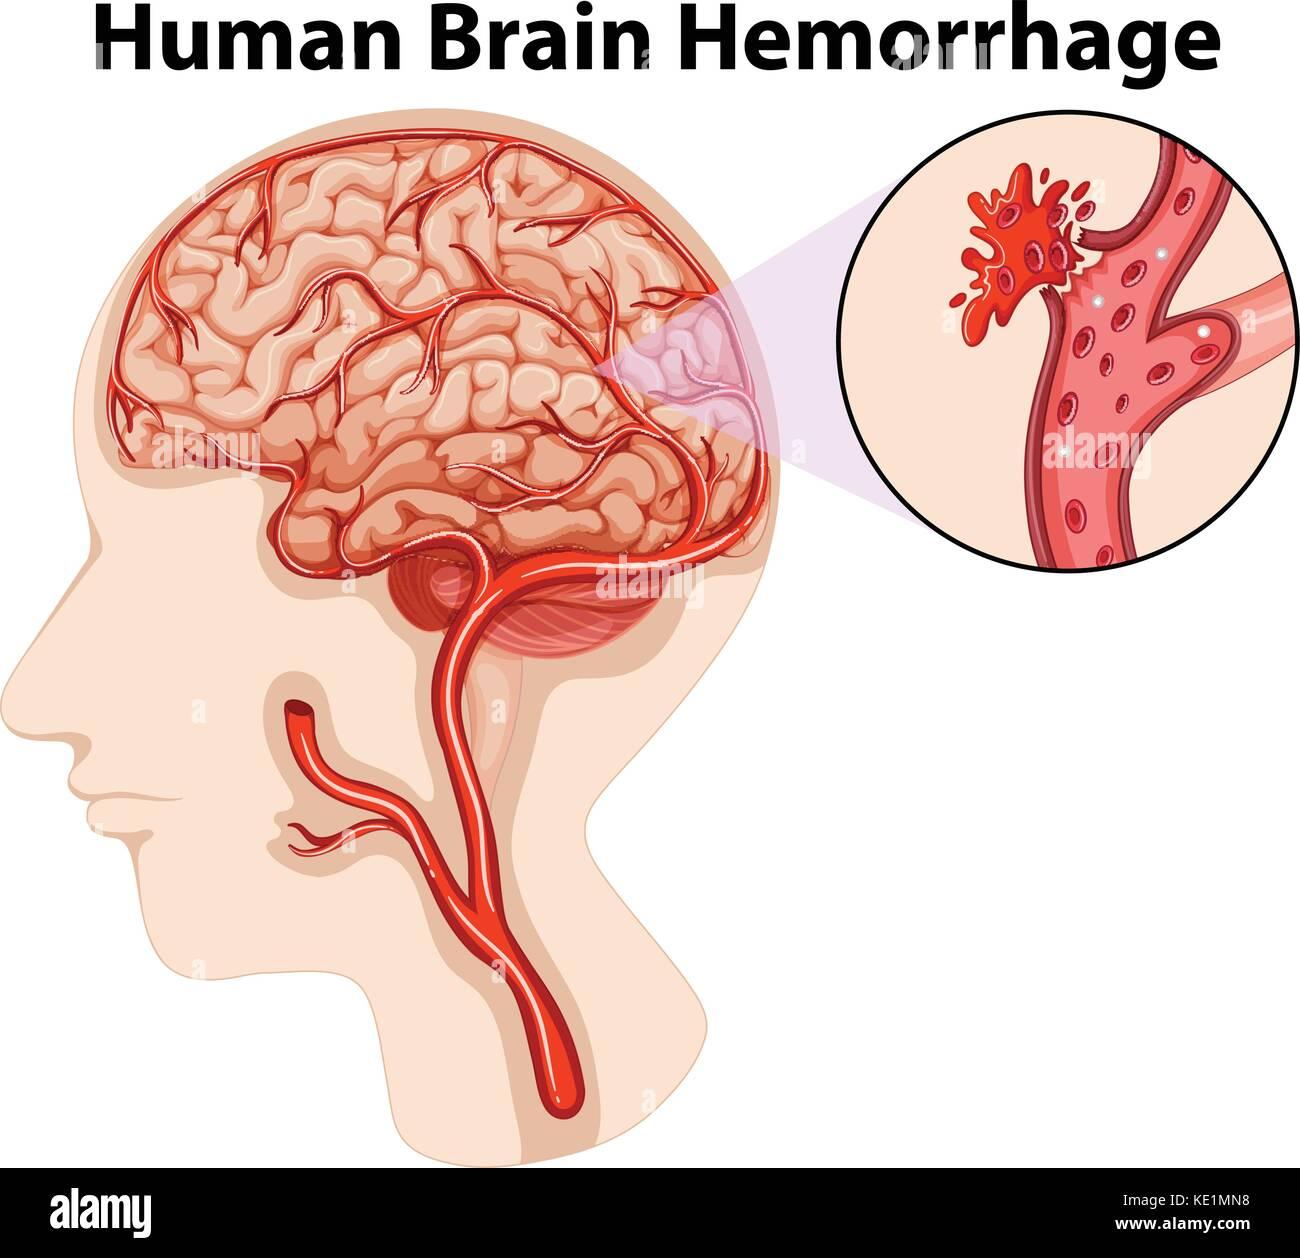 Diagram Of Human Brain Hemorrhage Illustration Stock Vector Art